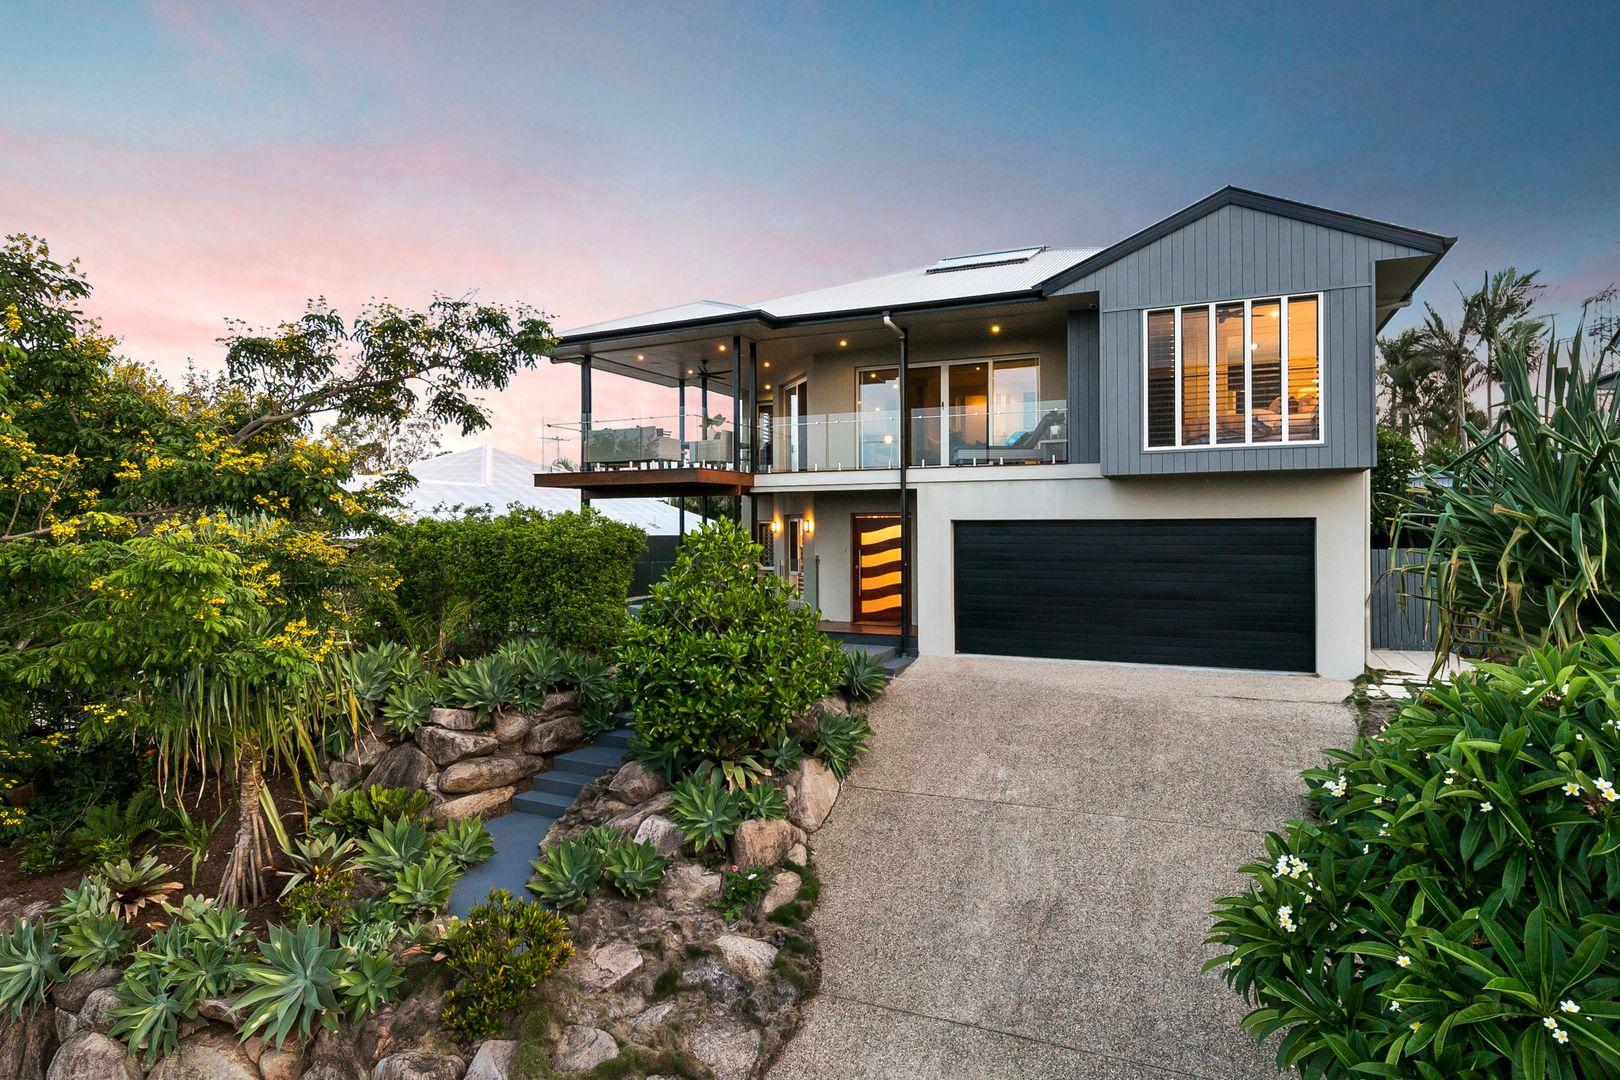 79 Dove Tree Crescent, Sinnamon Park QLD 4073, Image 0